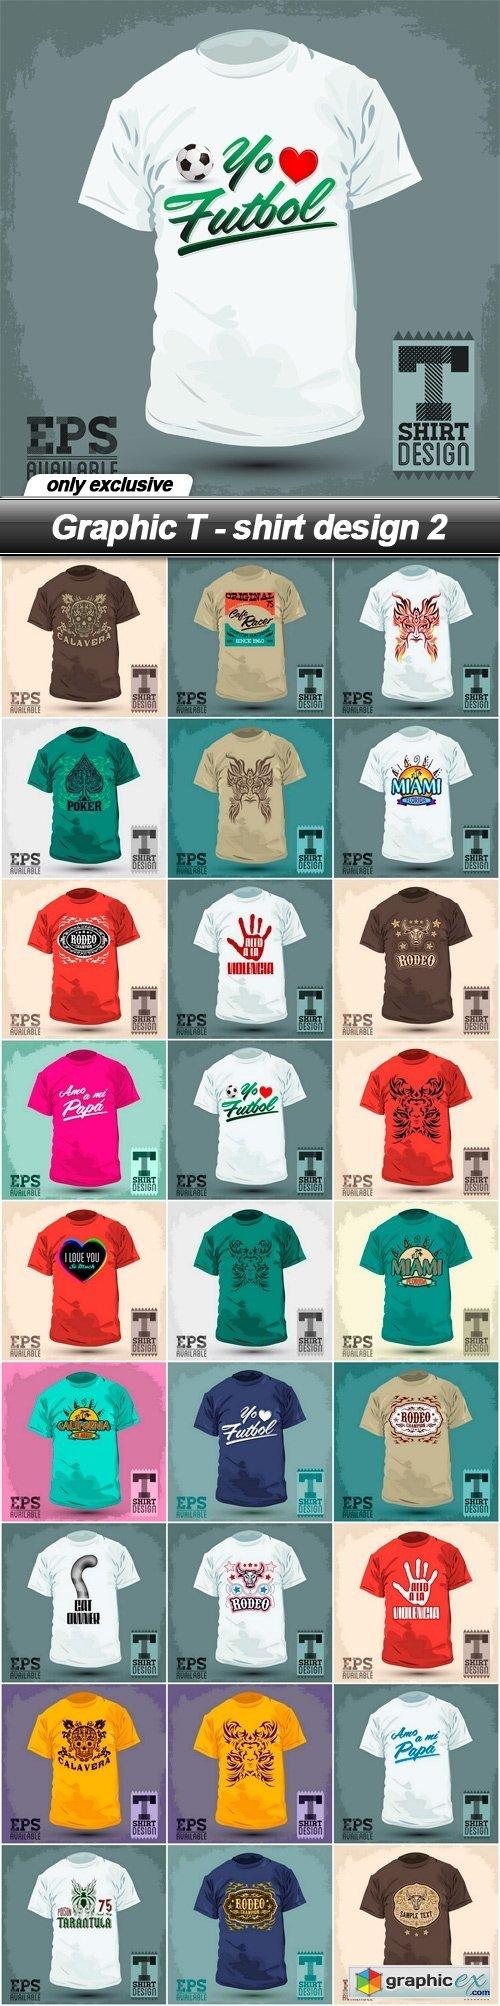 Shirt design eps - Graphic T Shirt Design 2 27 Eps